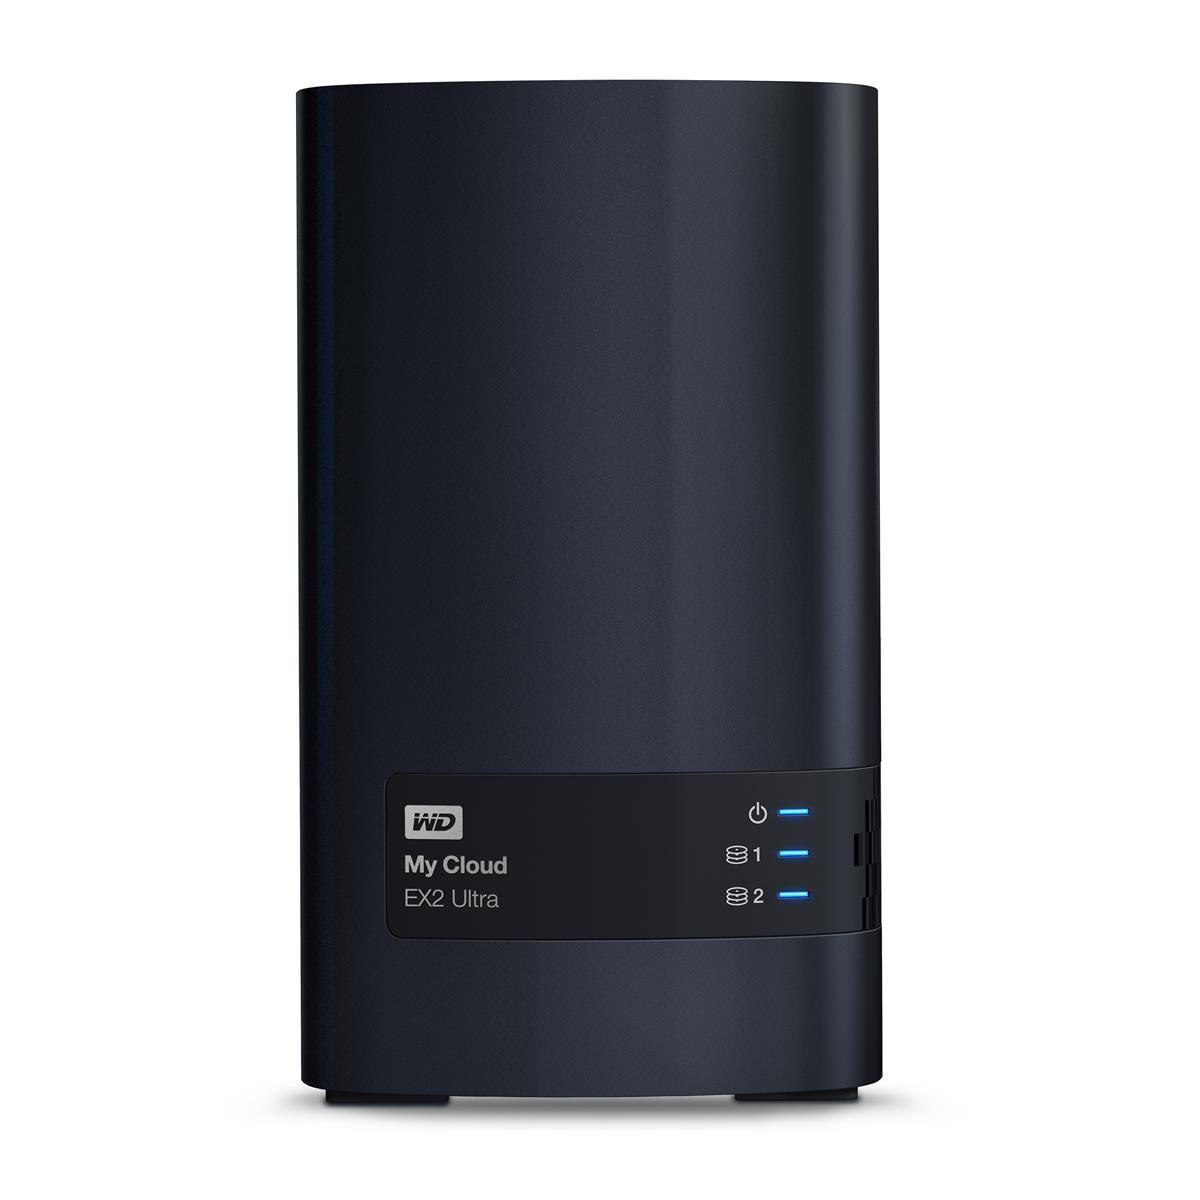 WD My Cloud EX2 Ultra (2 x 2TB) 4TB 2 x Bay High Performance Cloud Storage Server